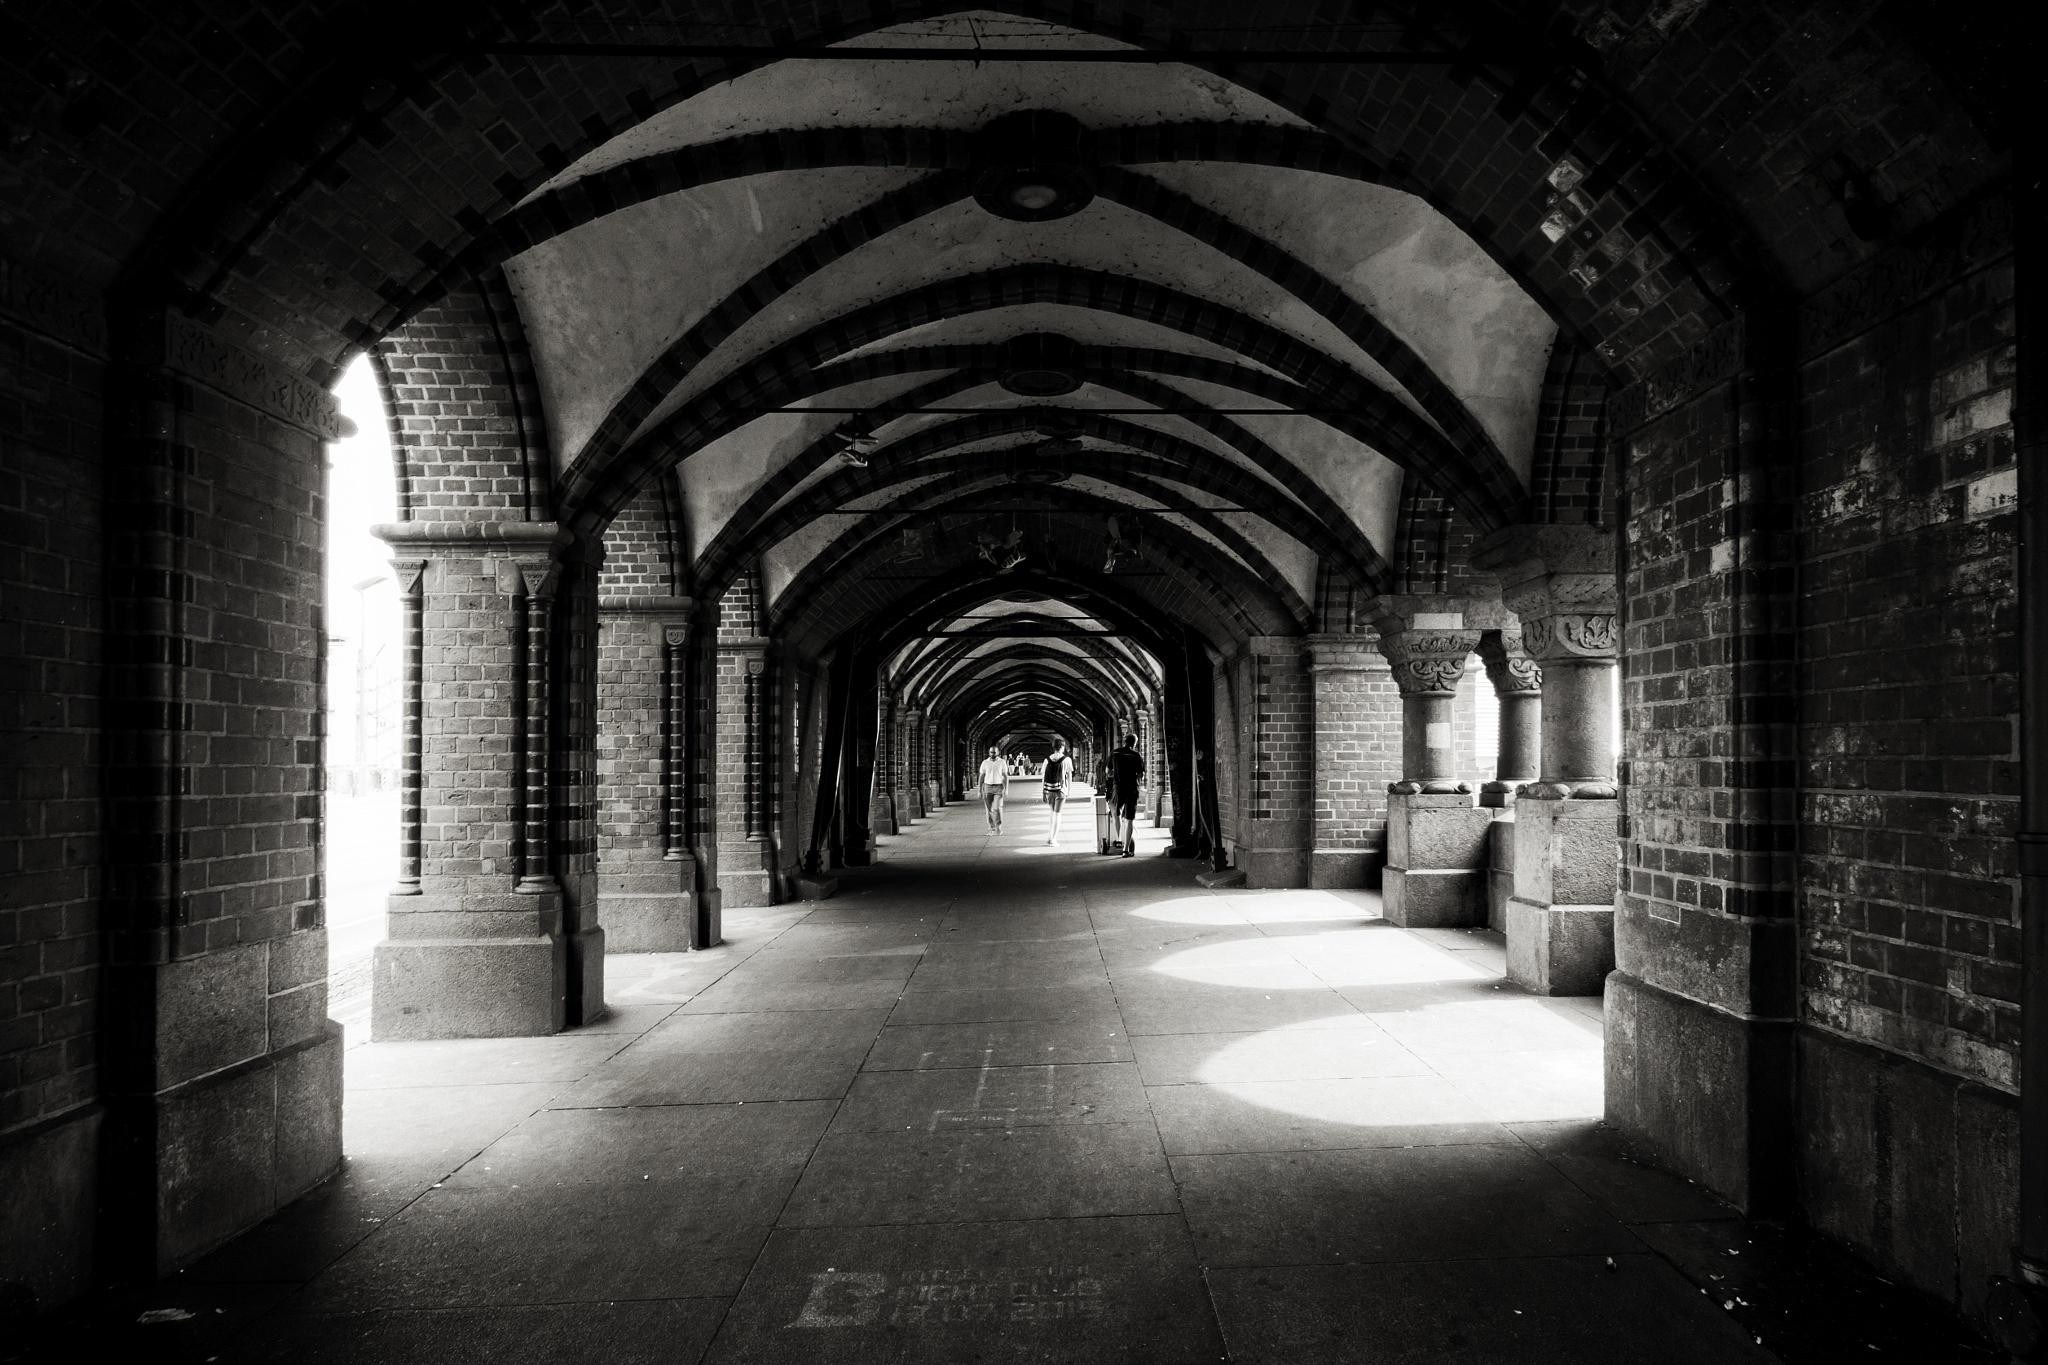 Passage by Lothar Bendix